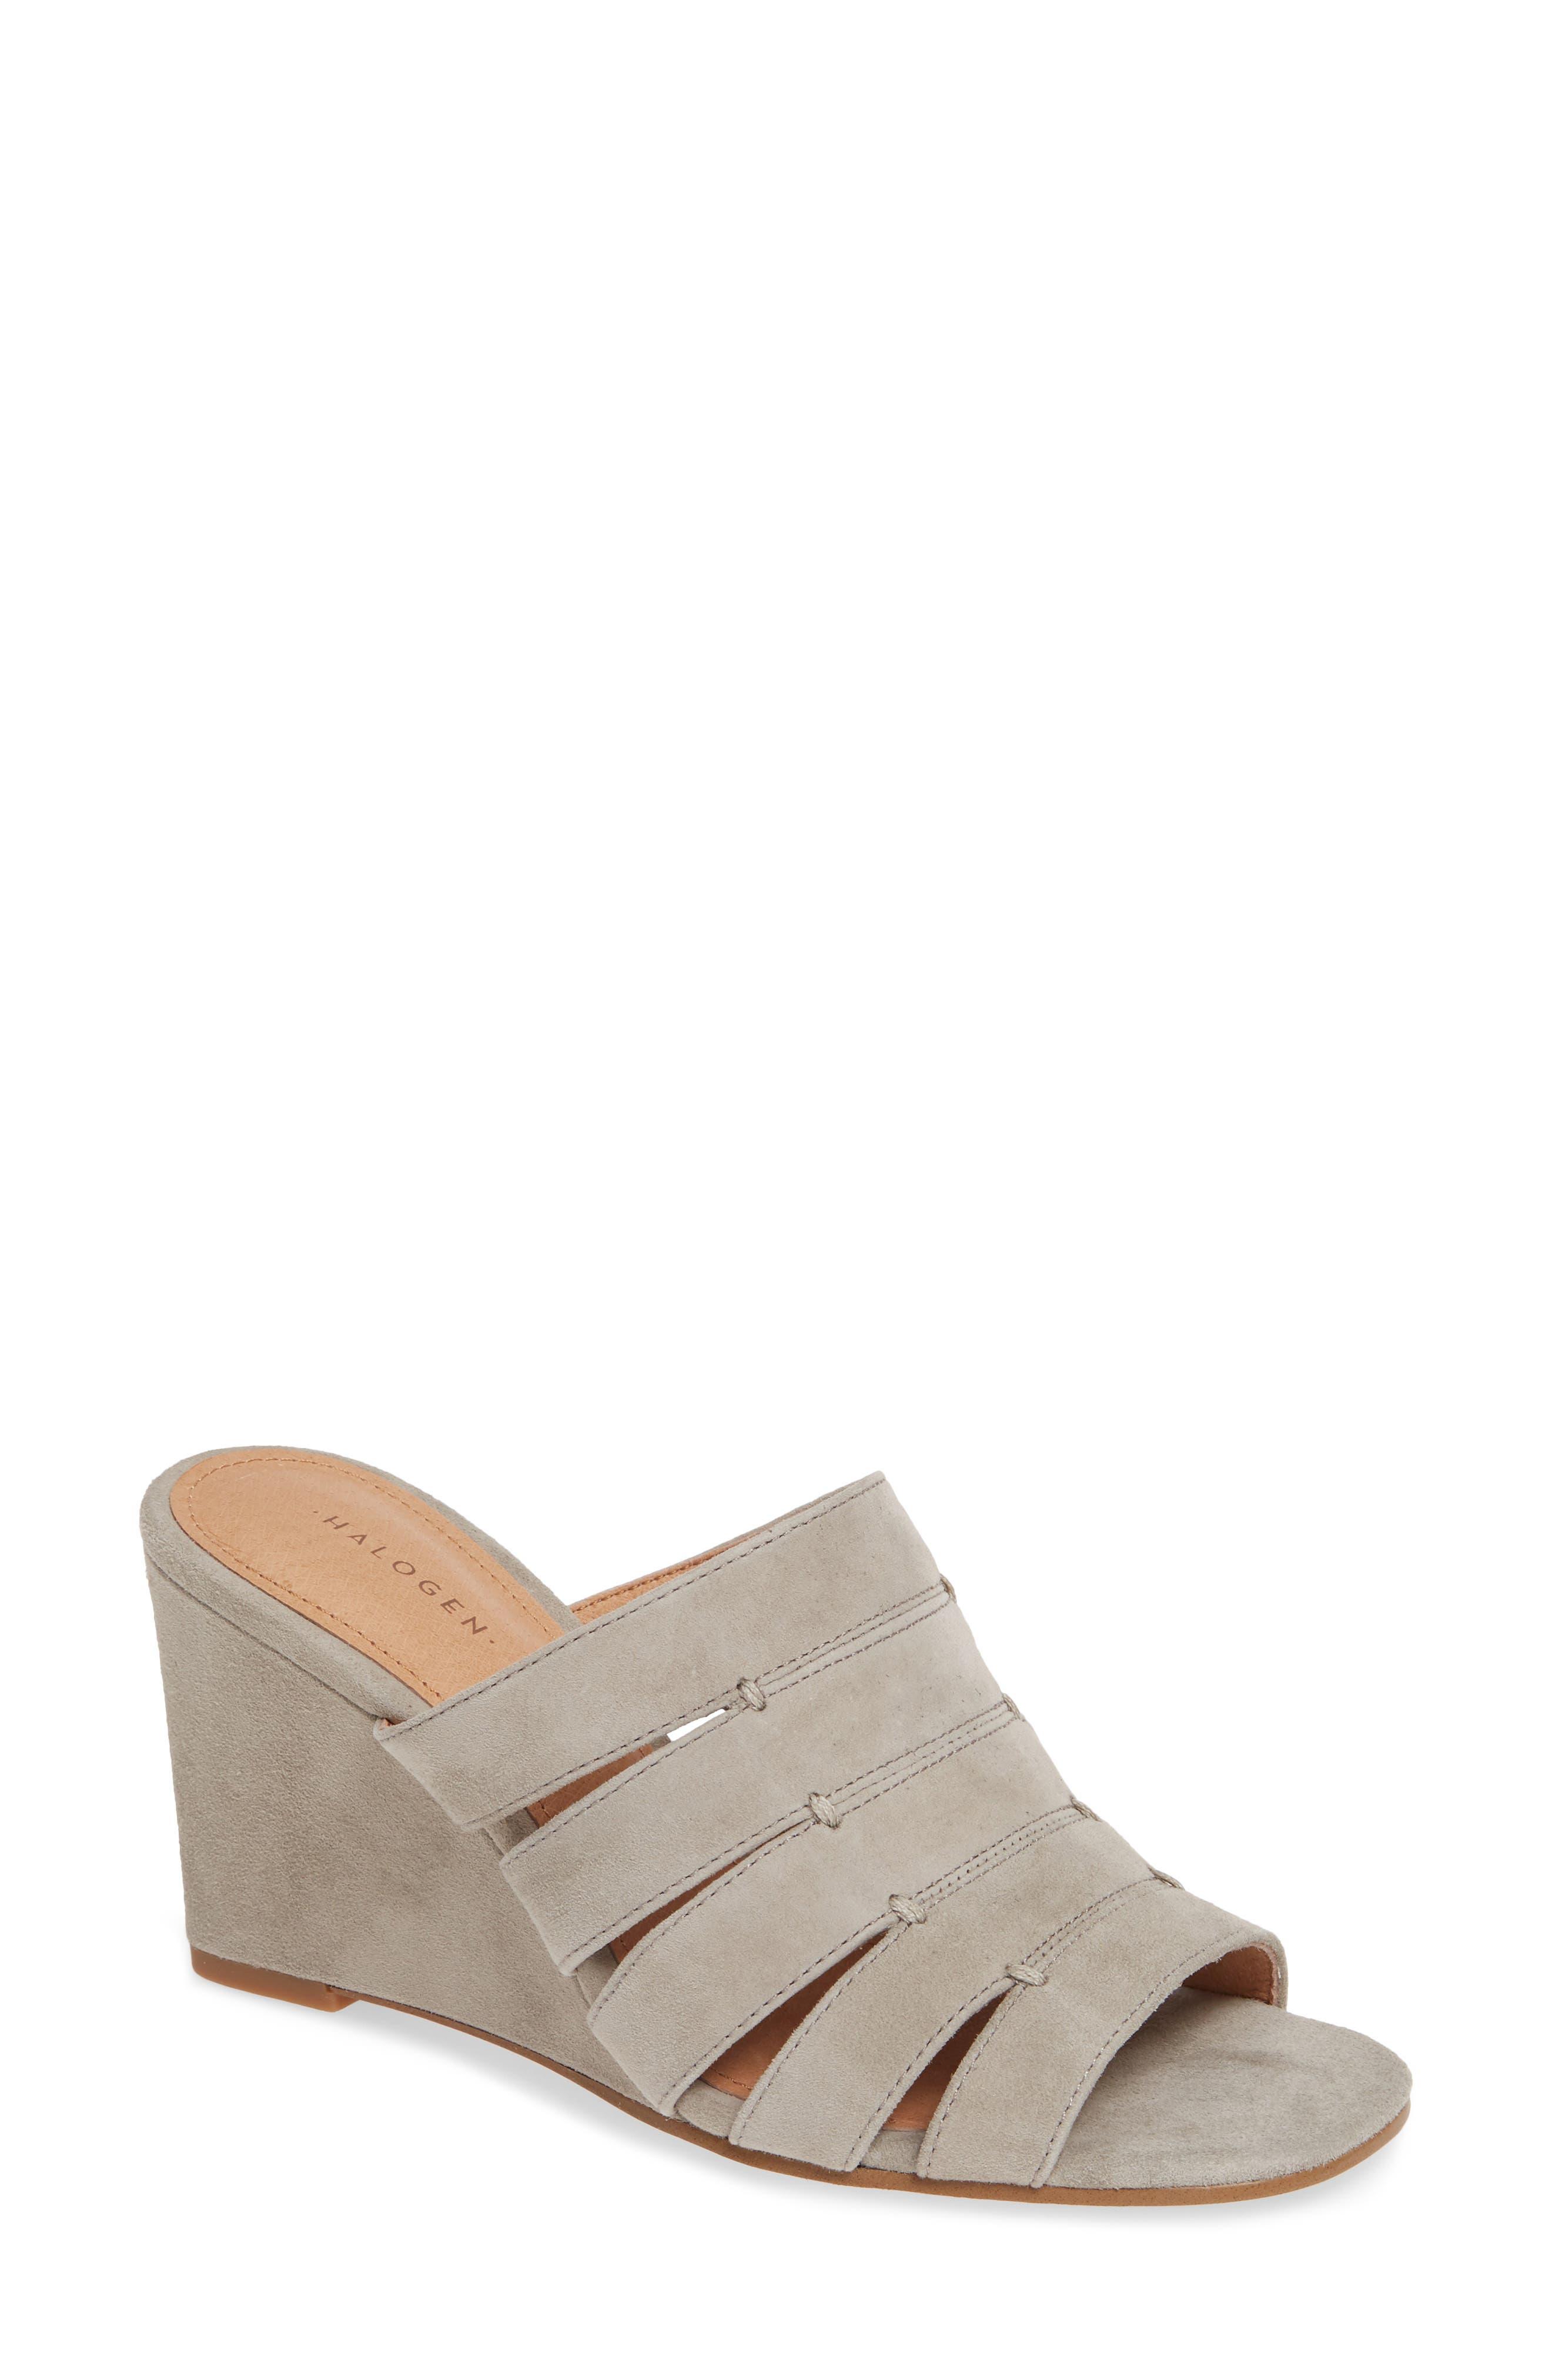 b85bdf8793c Women s Halogen® Mules   Slides